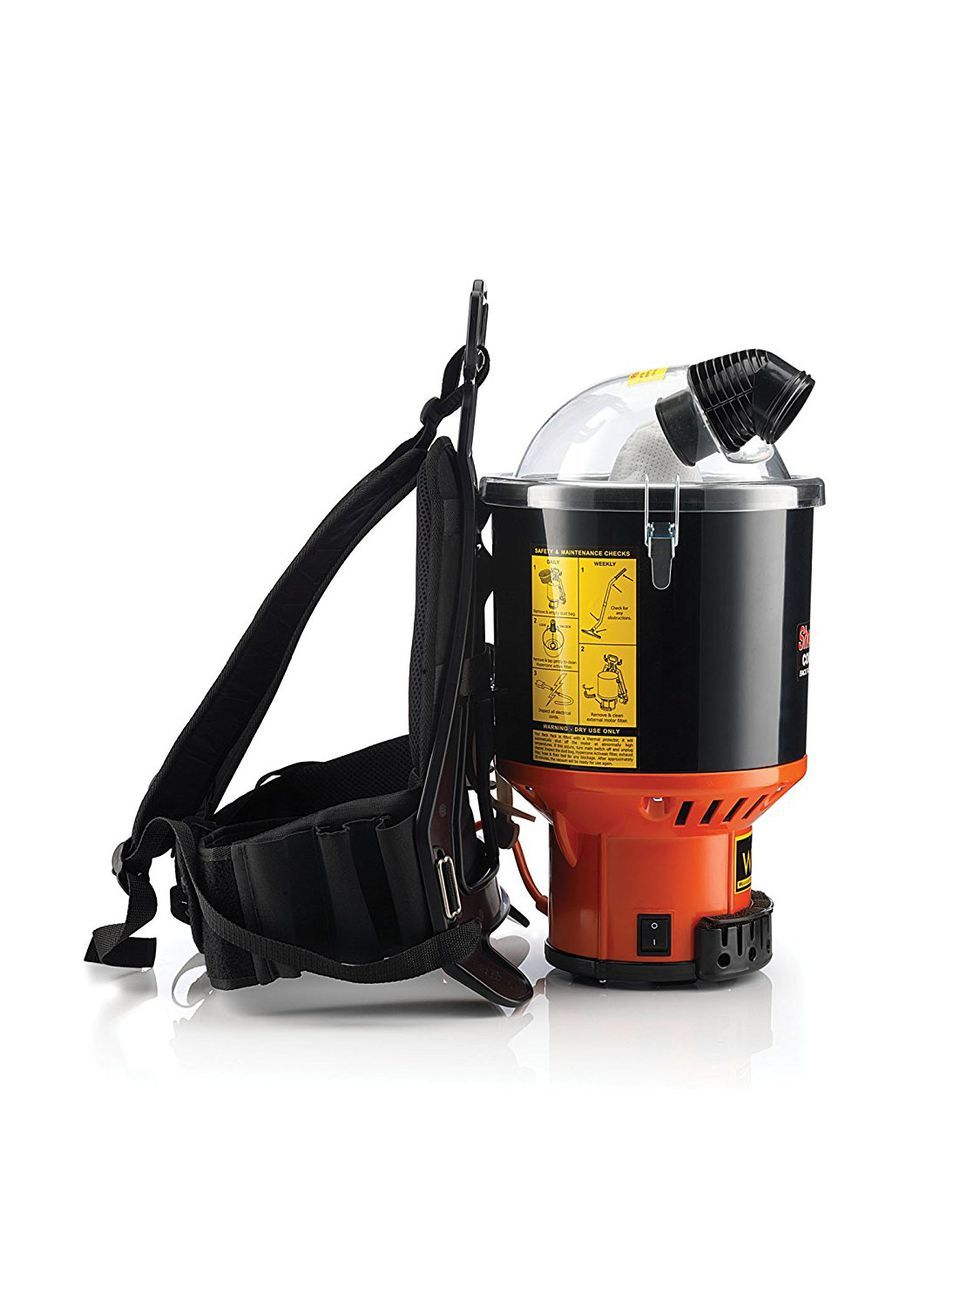 51 tips air duct cleaning diy backpack vacuum vacuums